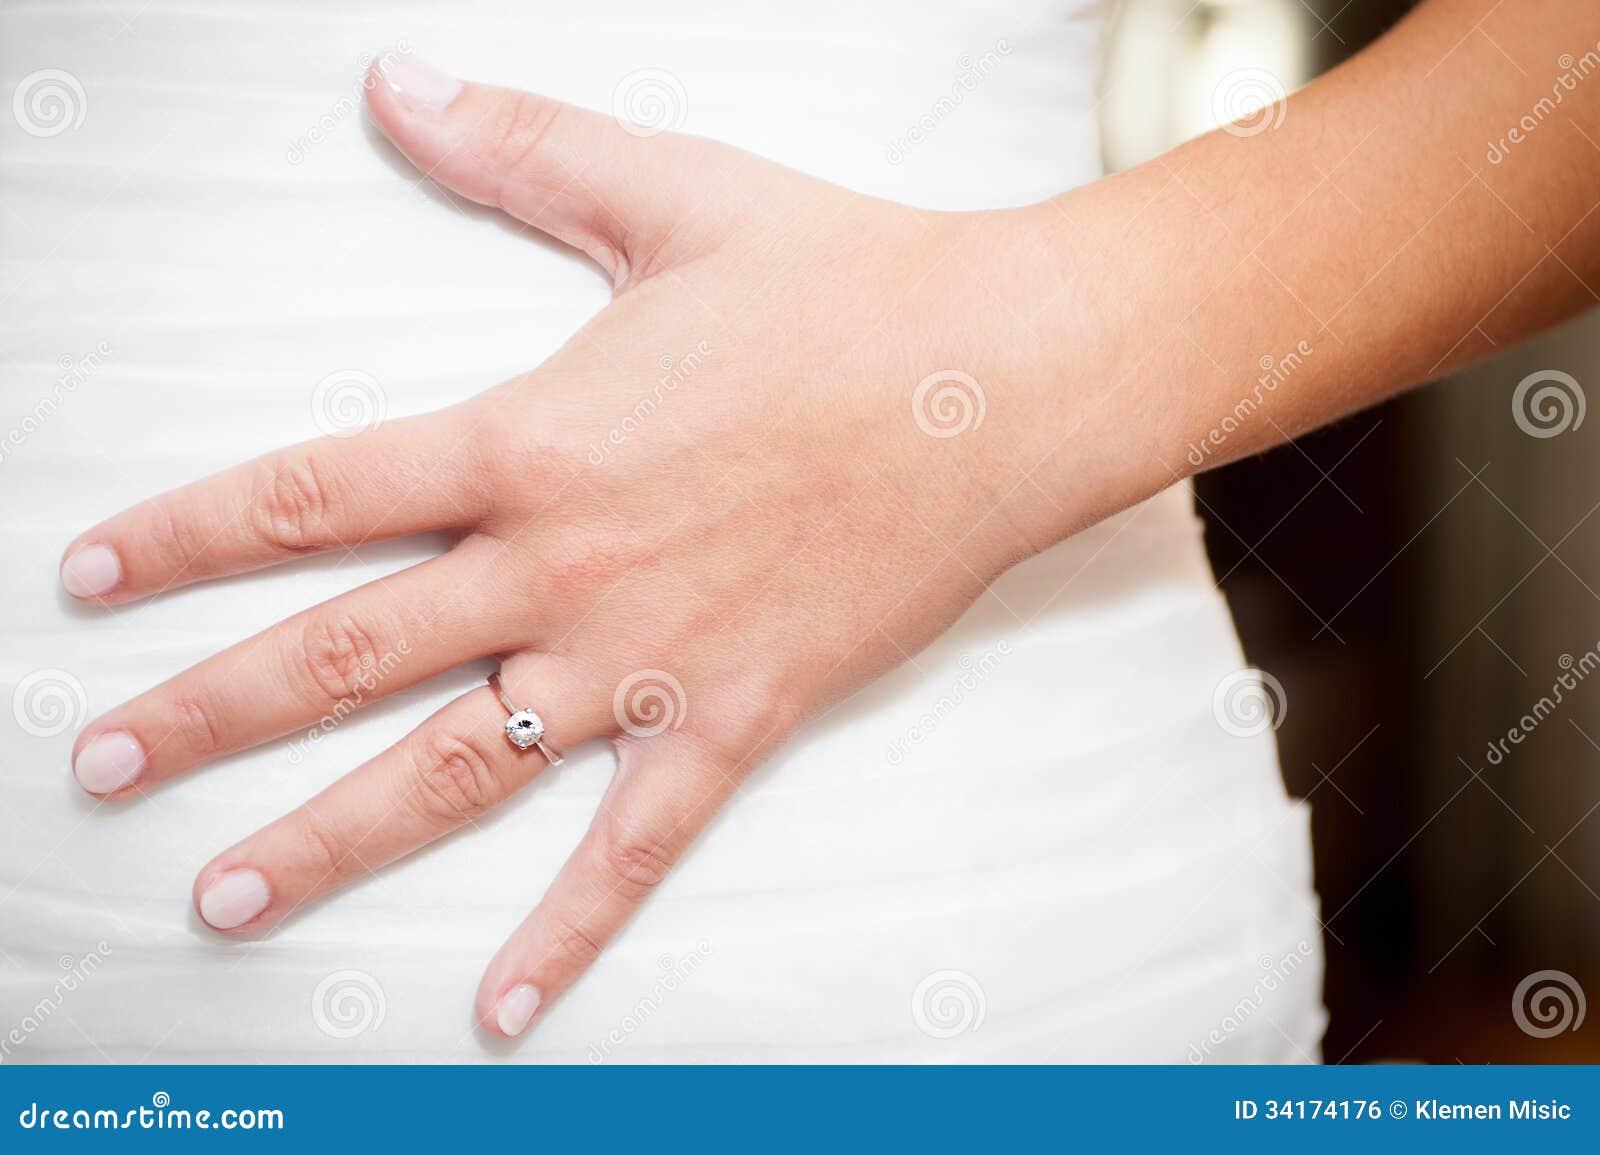 la main de la femme avec la bague de fian ailles sur la robe de mariage image libre de droits. Black Bedroom Furniture Sets. Home Design Ideas